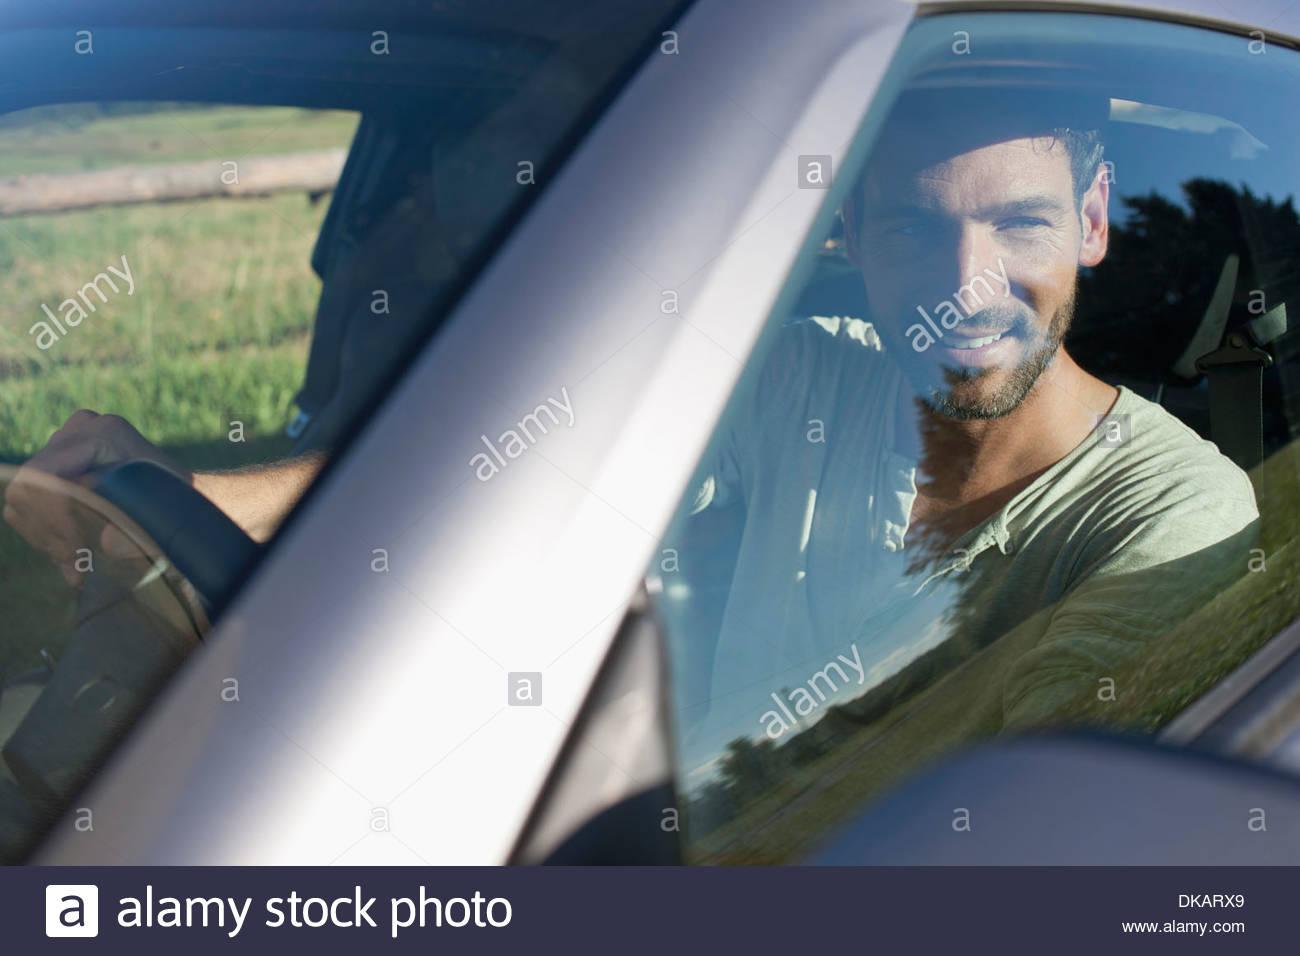 Mature man sitting inside car, smiling - Stock Image